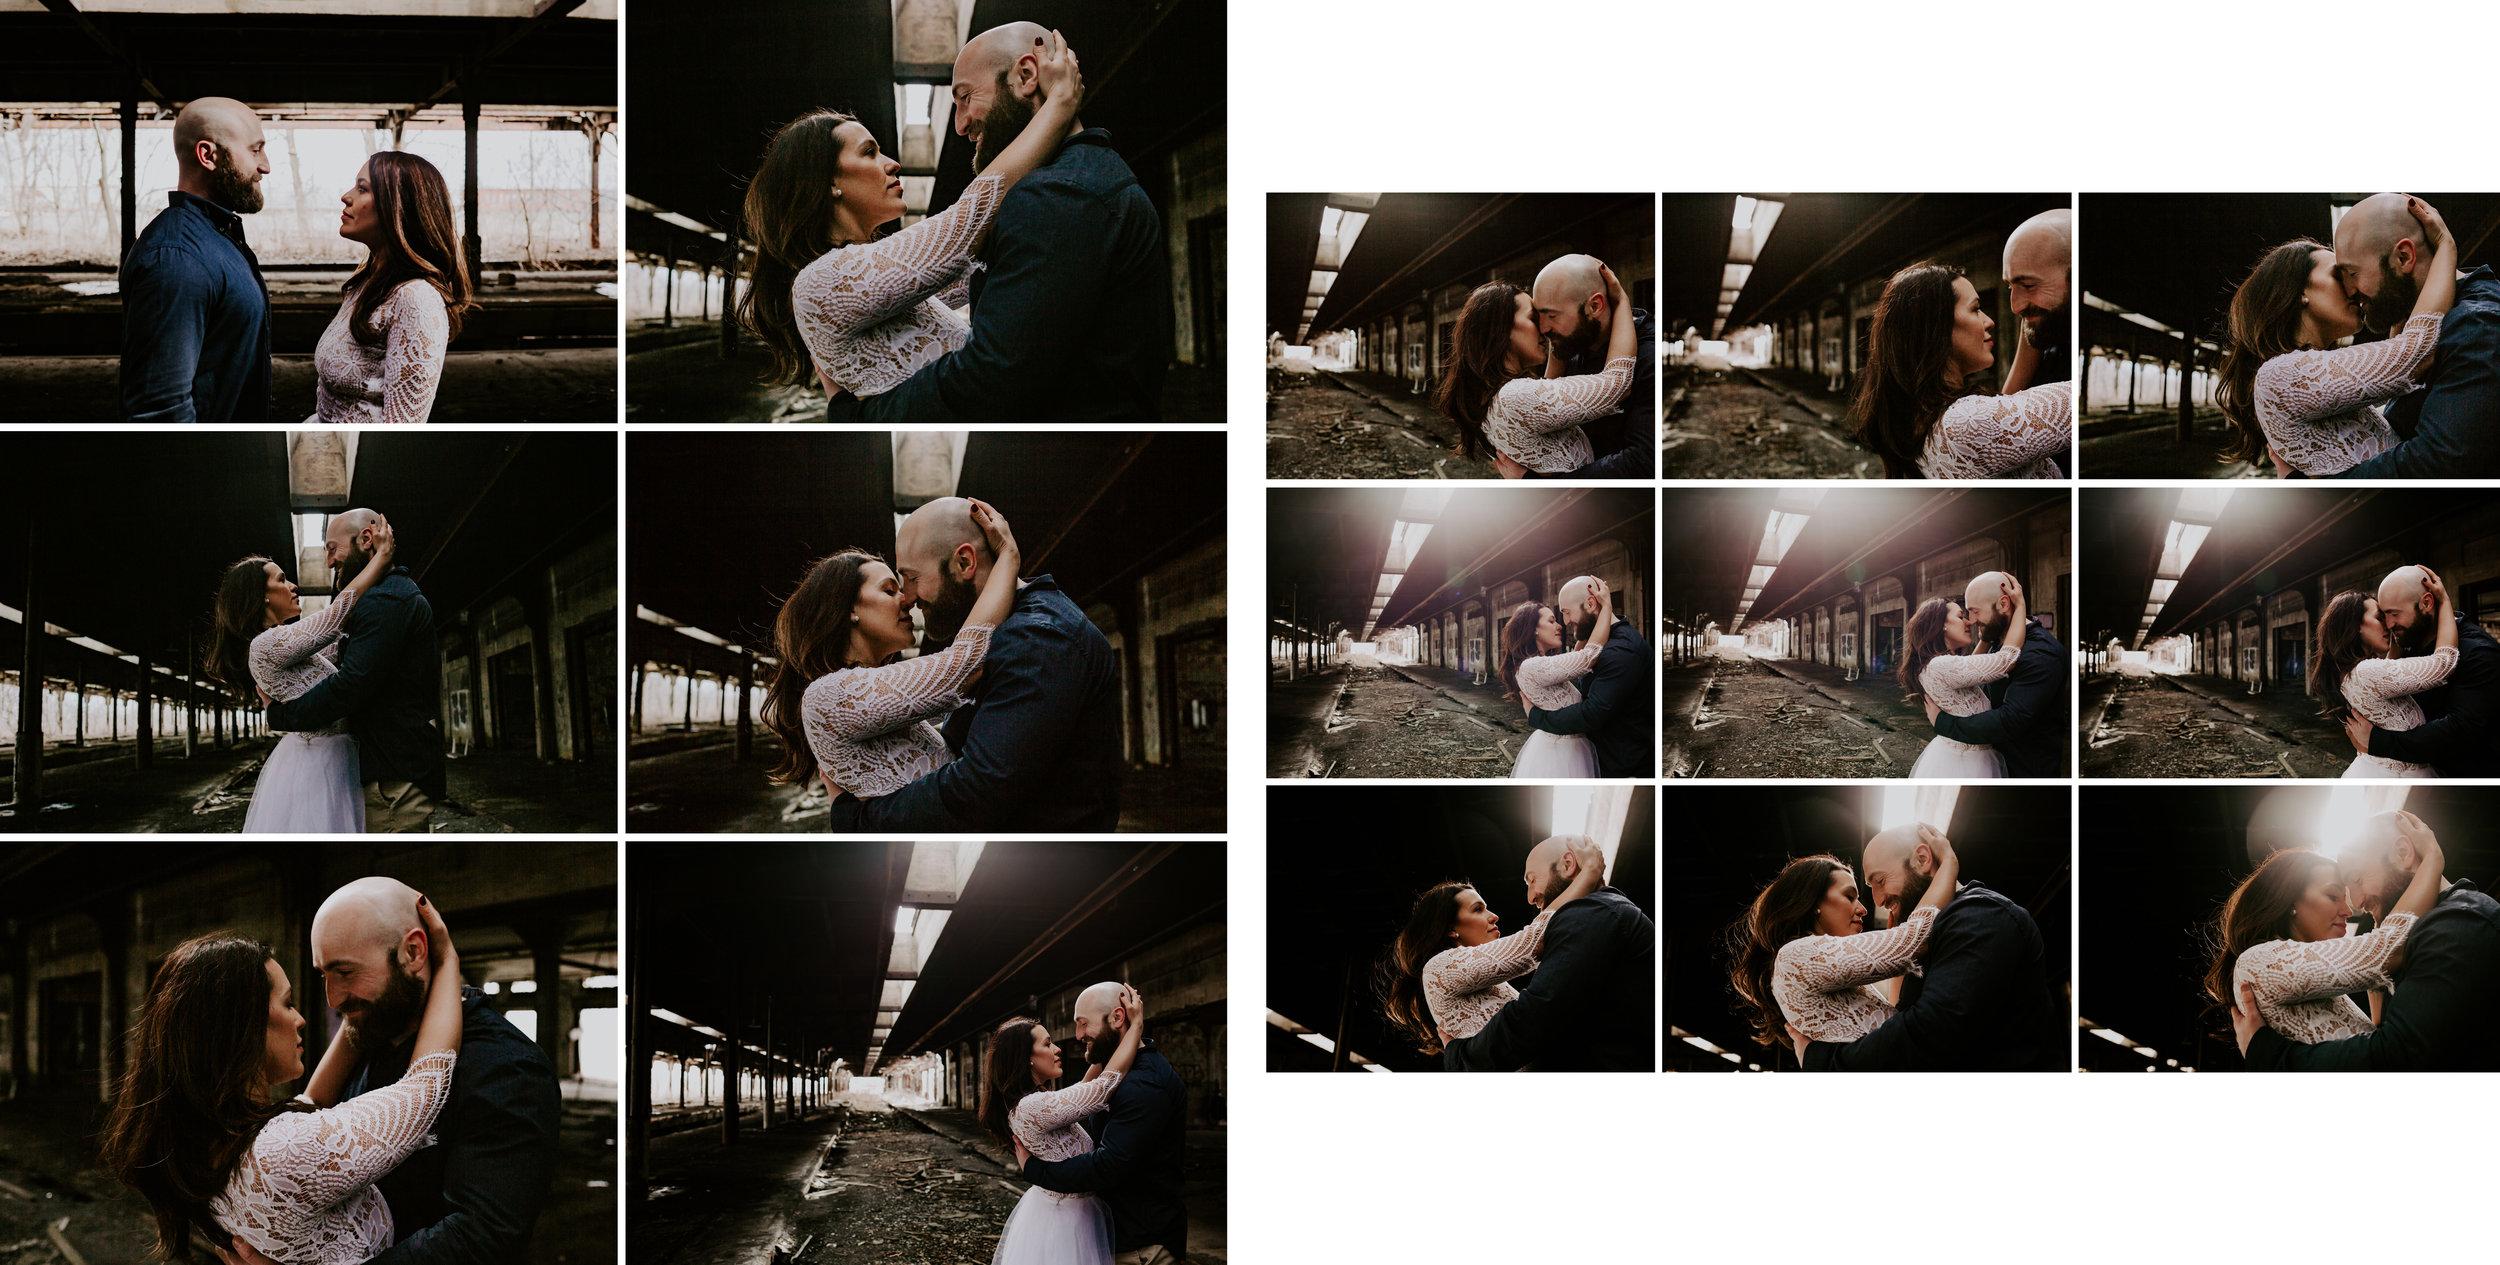 central terminal engagment wedding photography buffalo ny (5 of 54).jpg